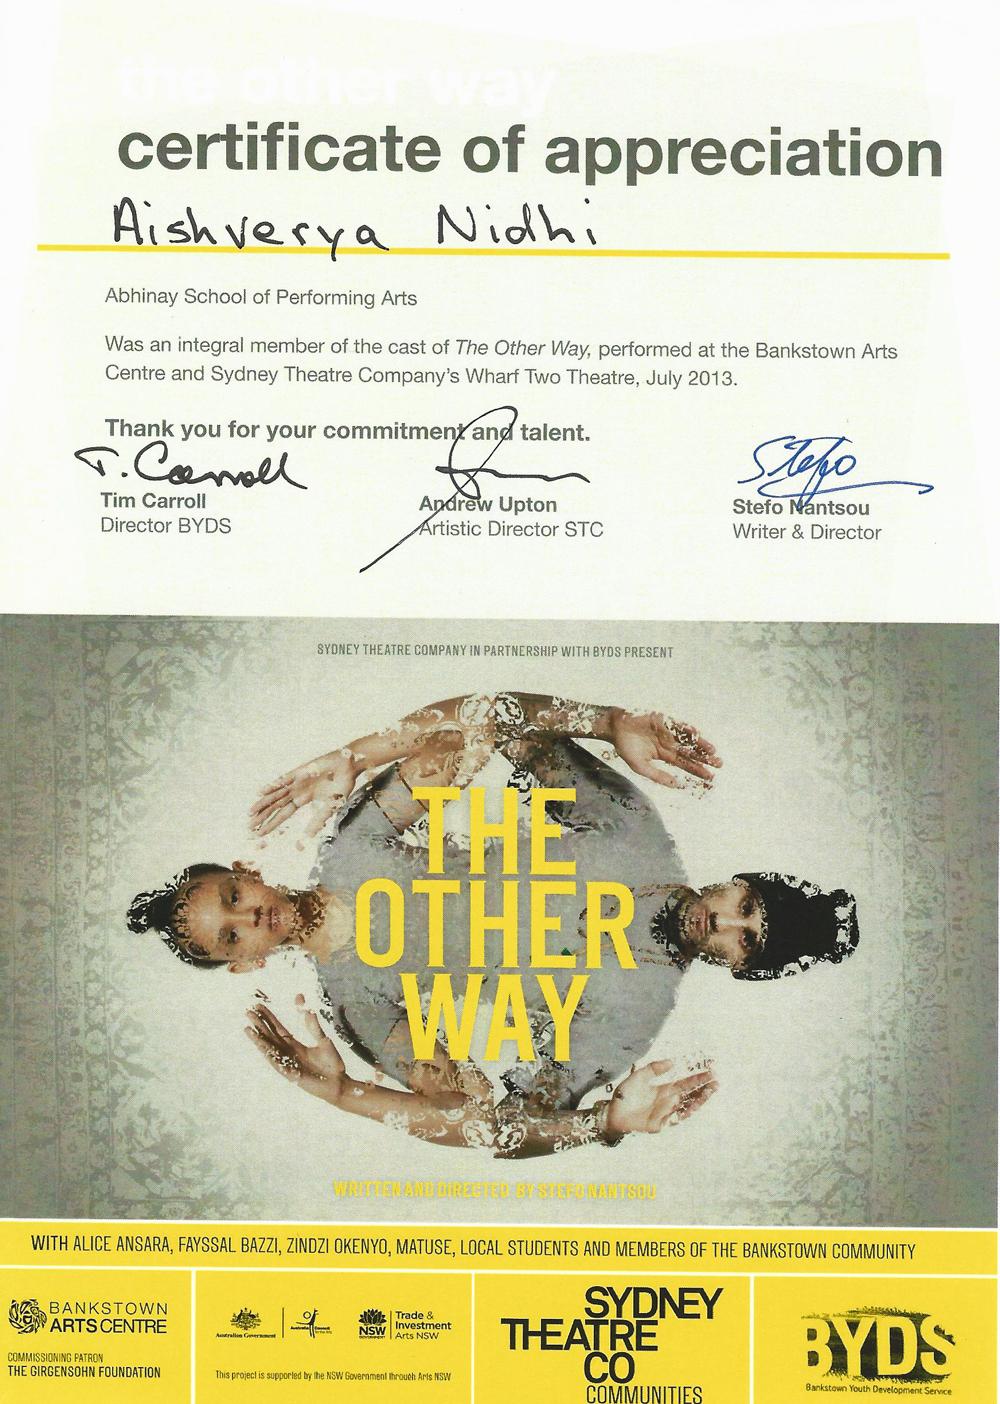 4.-The-Other-Way---Aishveryaa